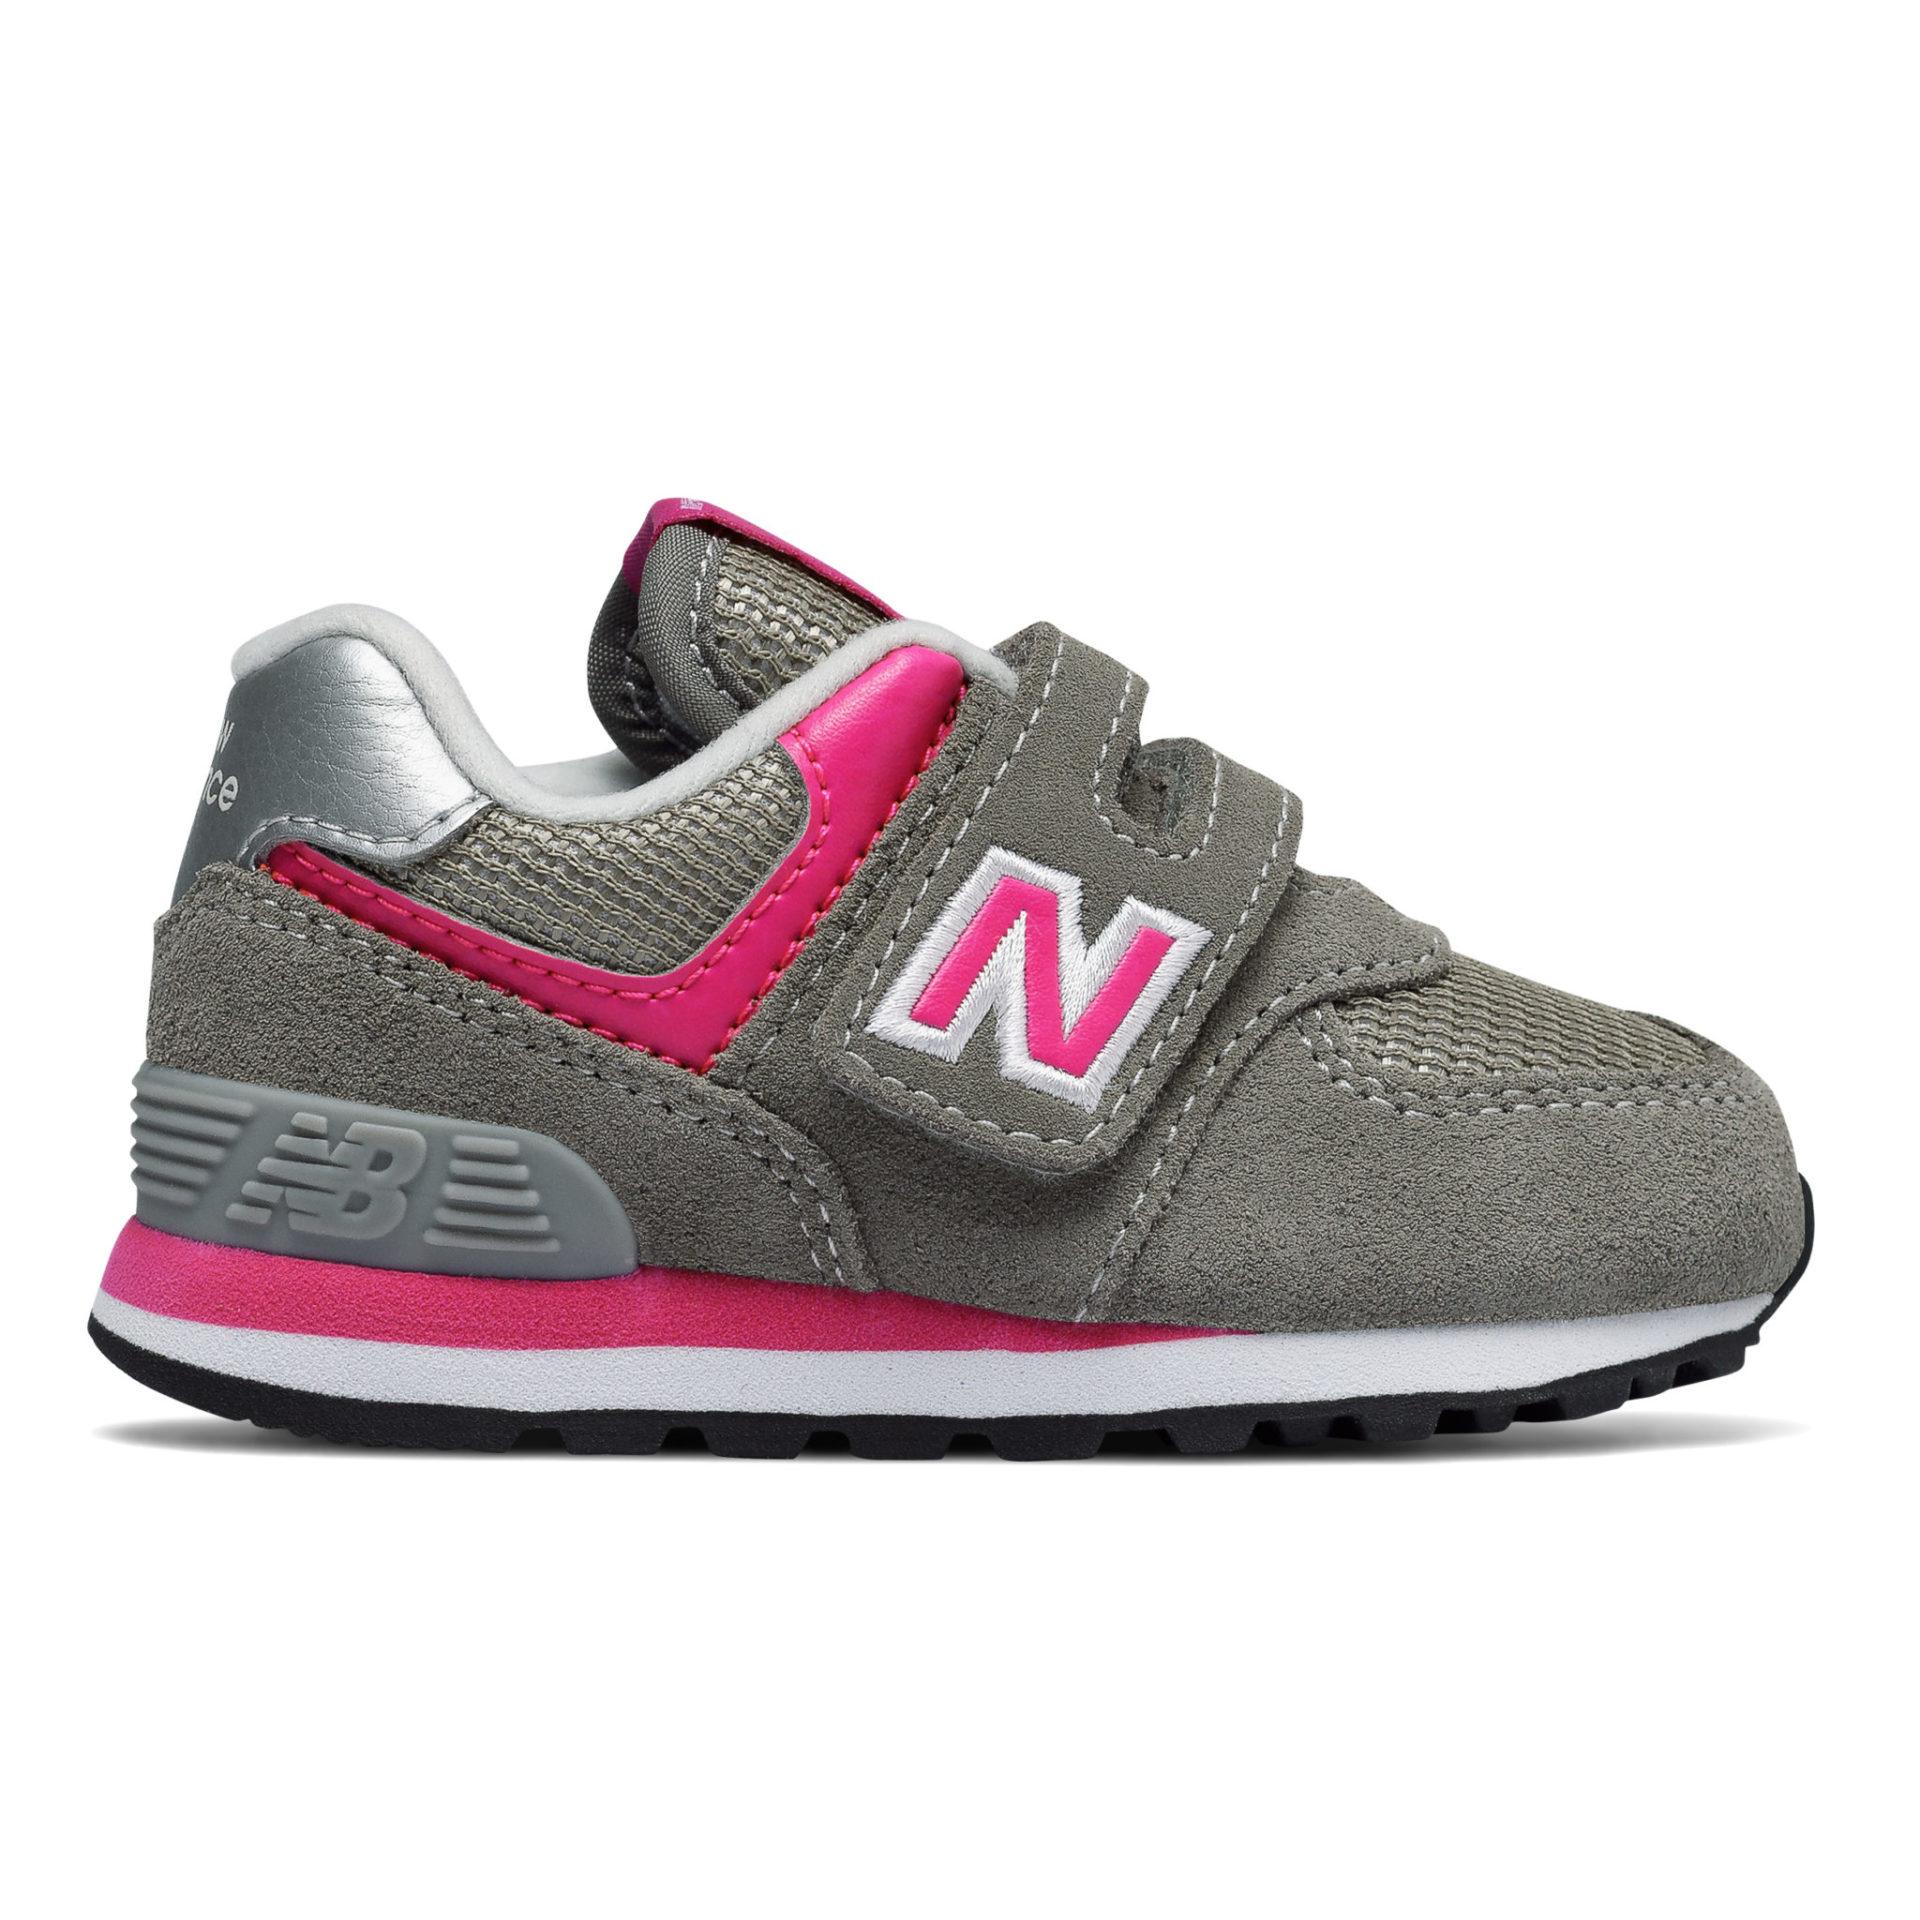 sports shoes b117d 32380 New Balance 574 Pink Grey Infant Velcro